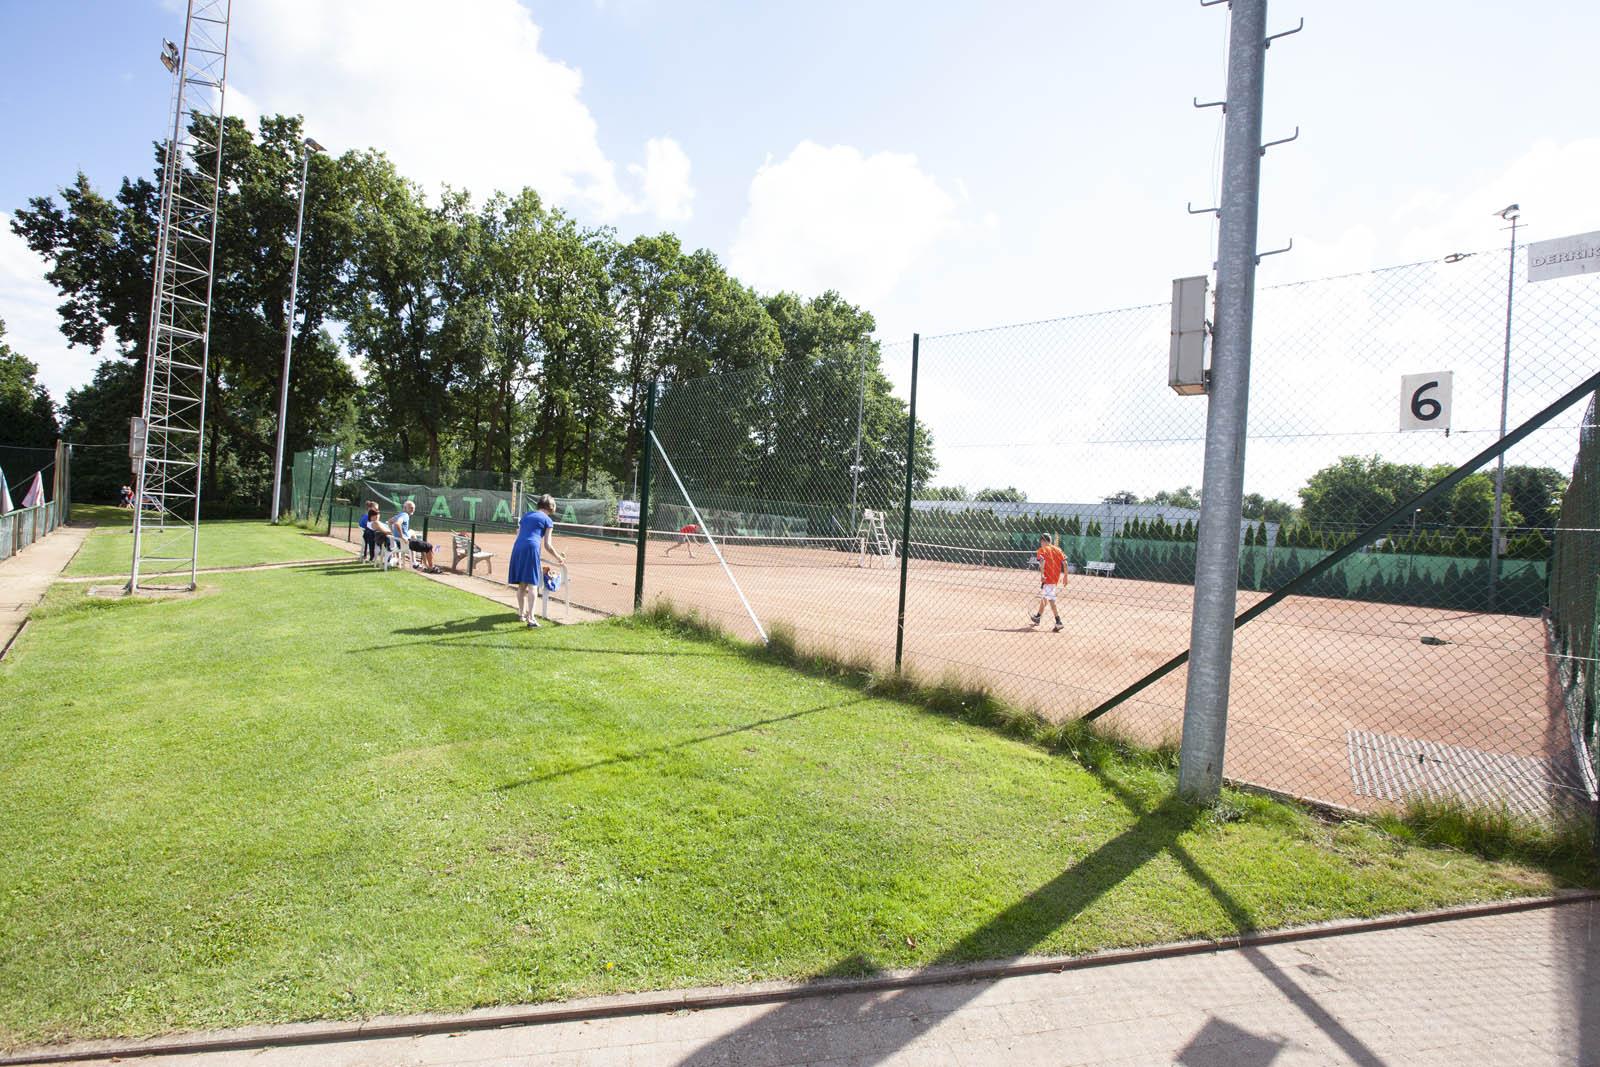 20120706_tennis_0007